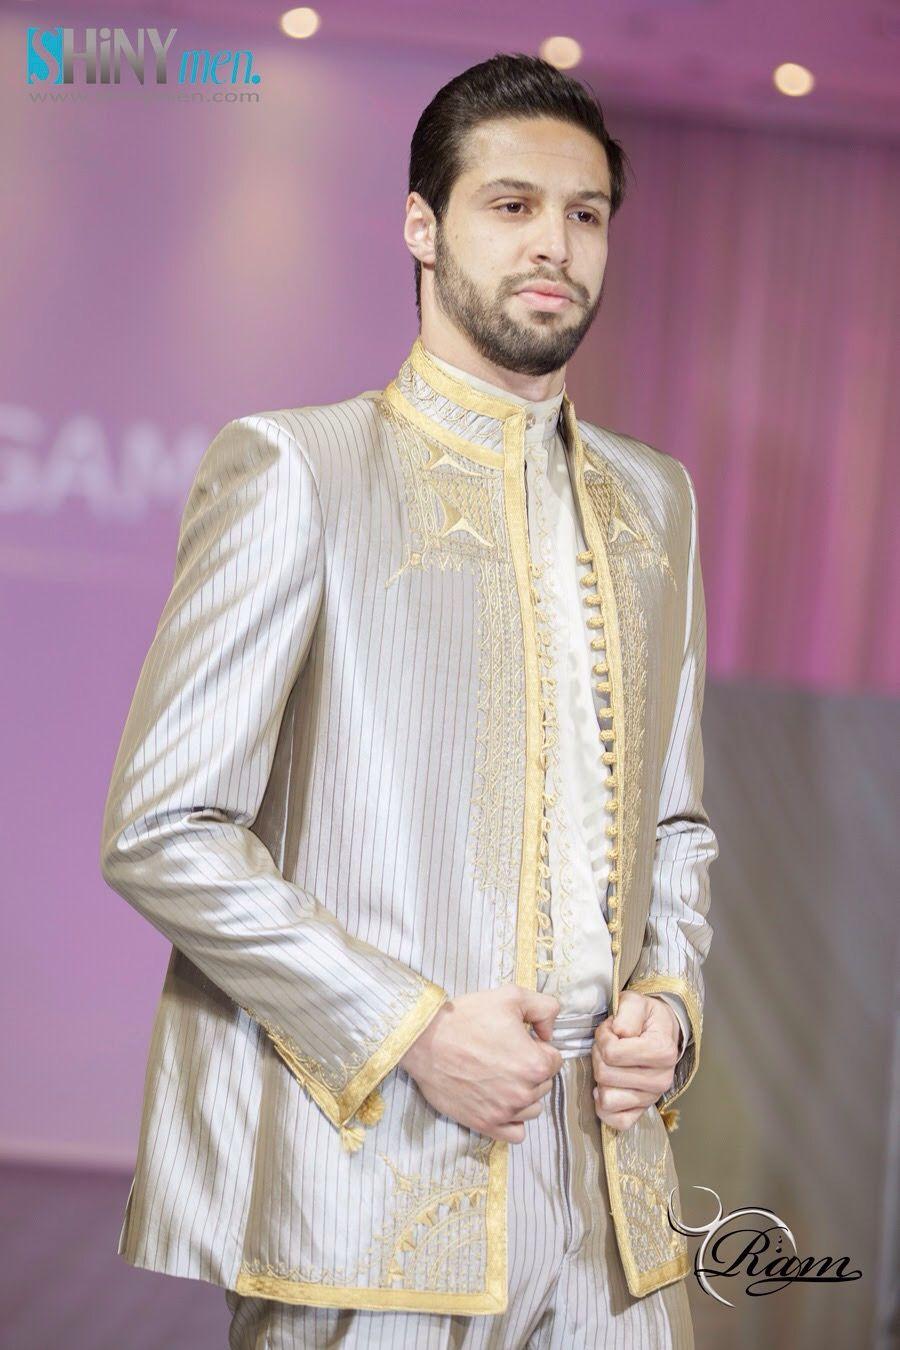 Costume en soie avec broderie traditionnelle tunisienne